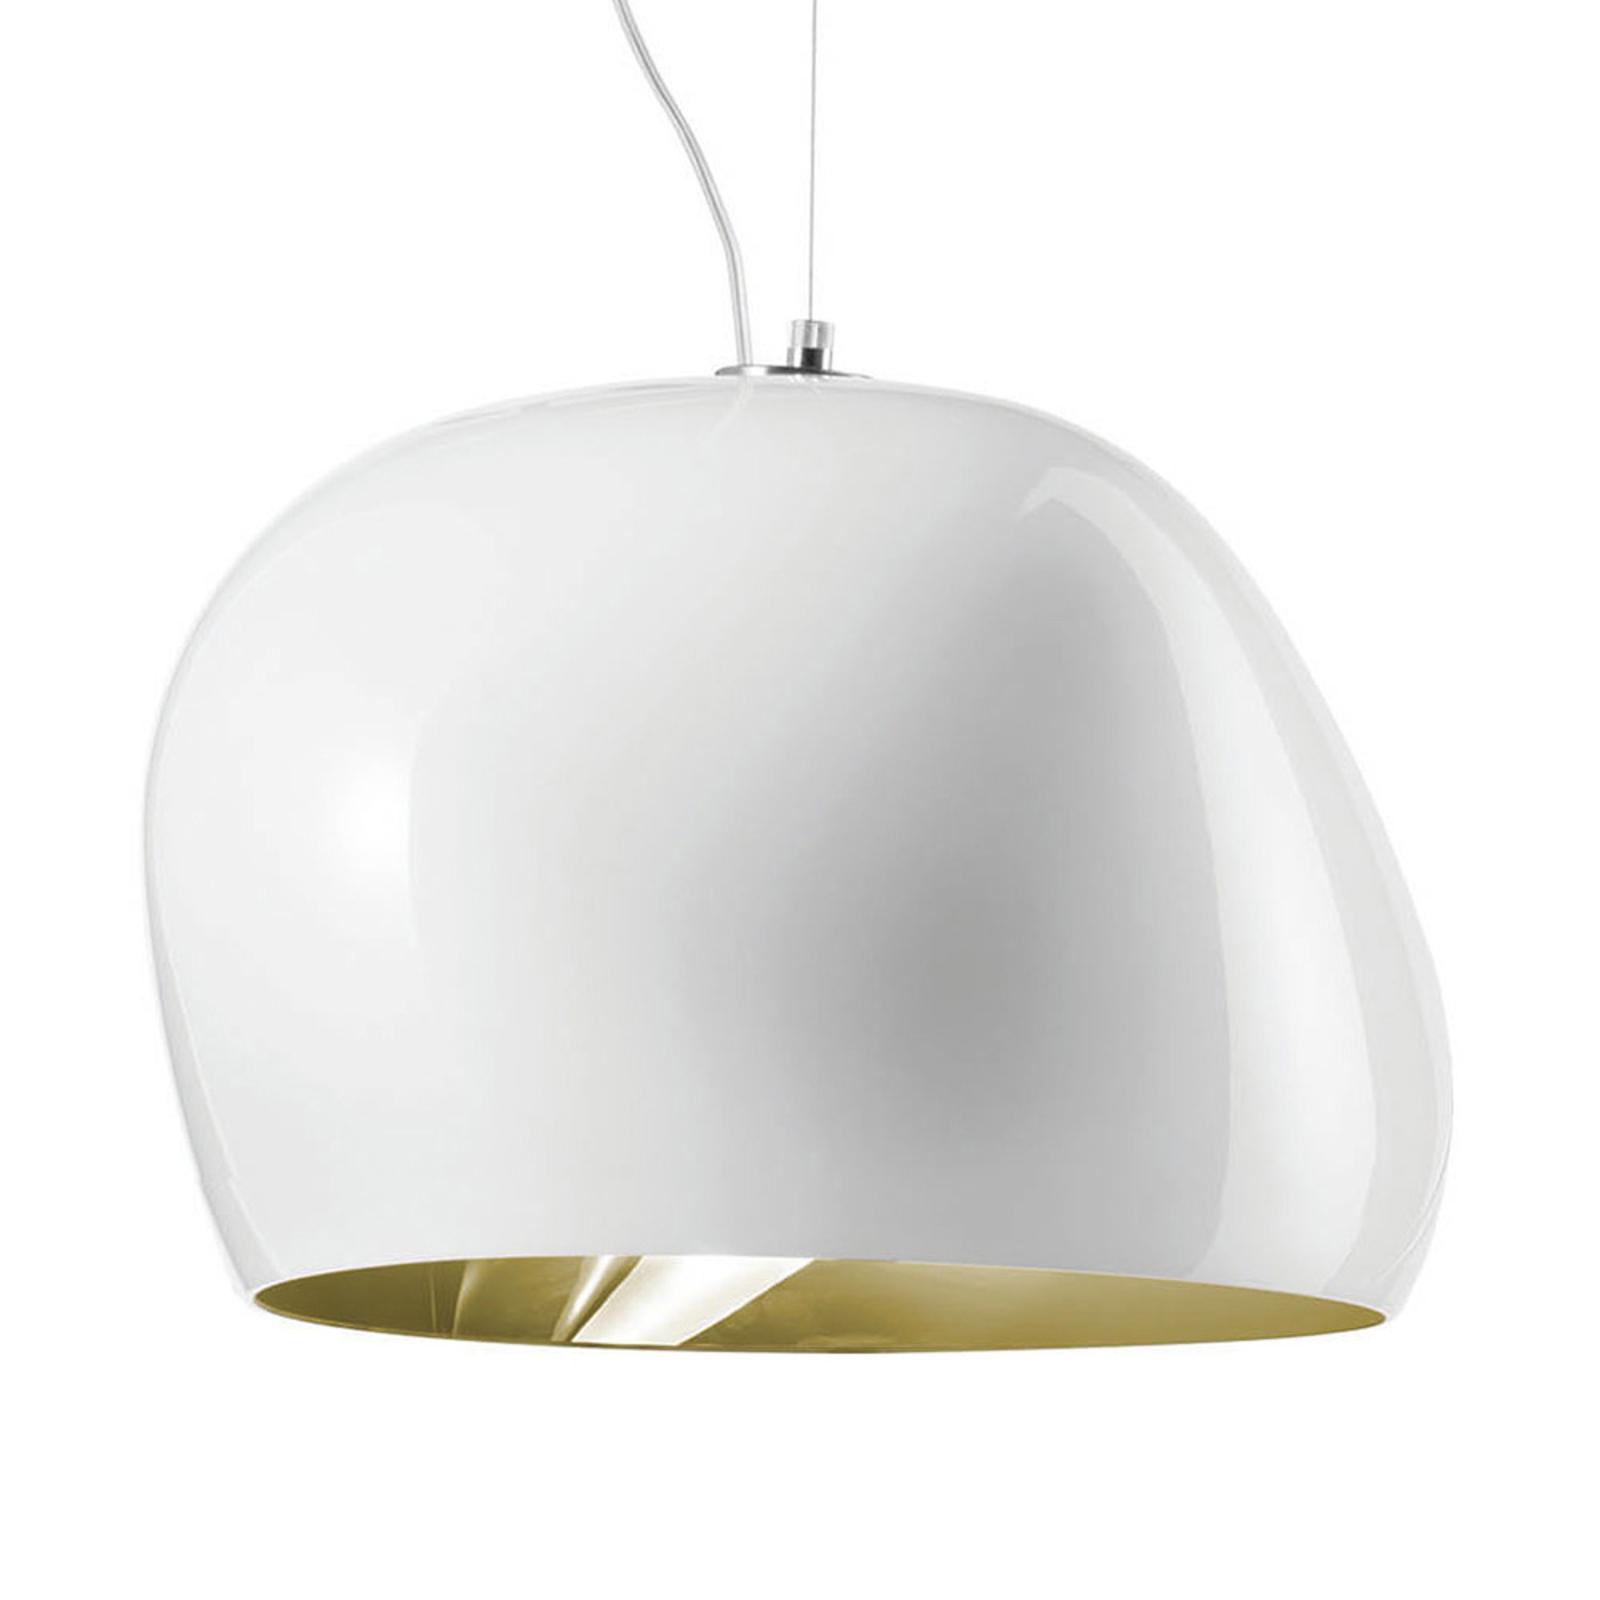 Hängeleuchte Surface Ø 40 cm,  E27, weiß/altgrün